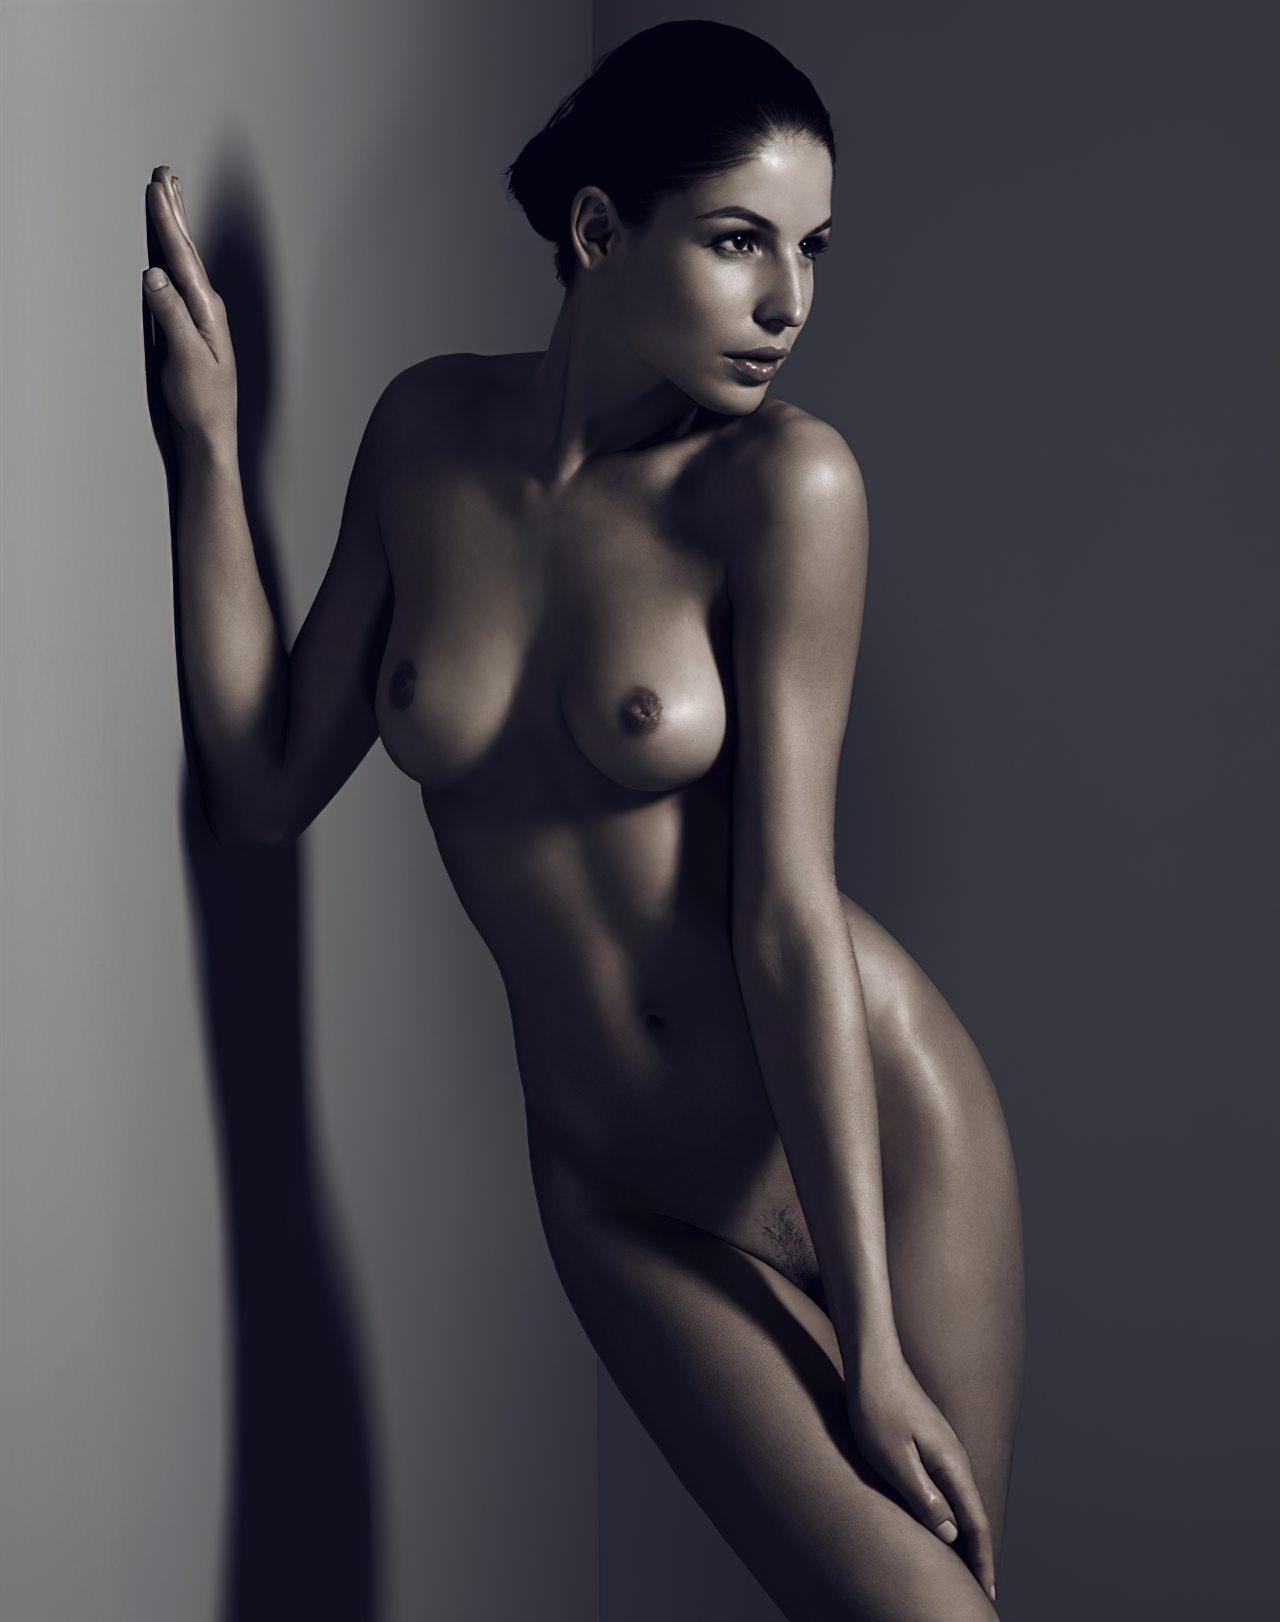 Mulher Gostosa (24)